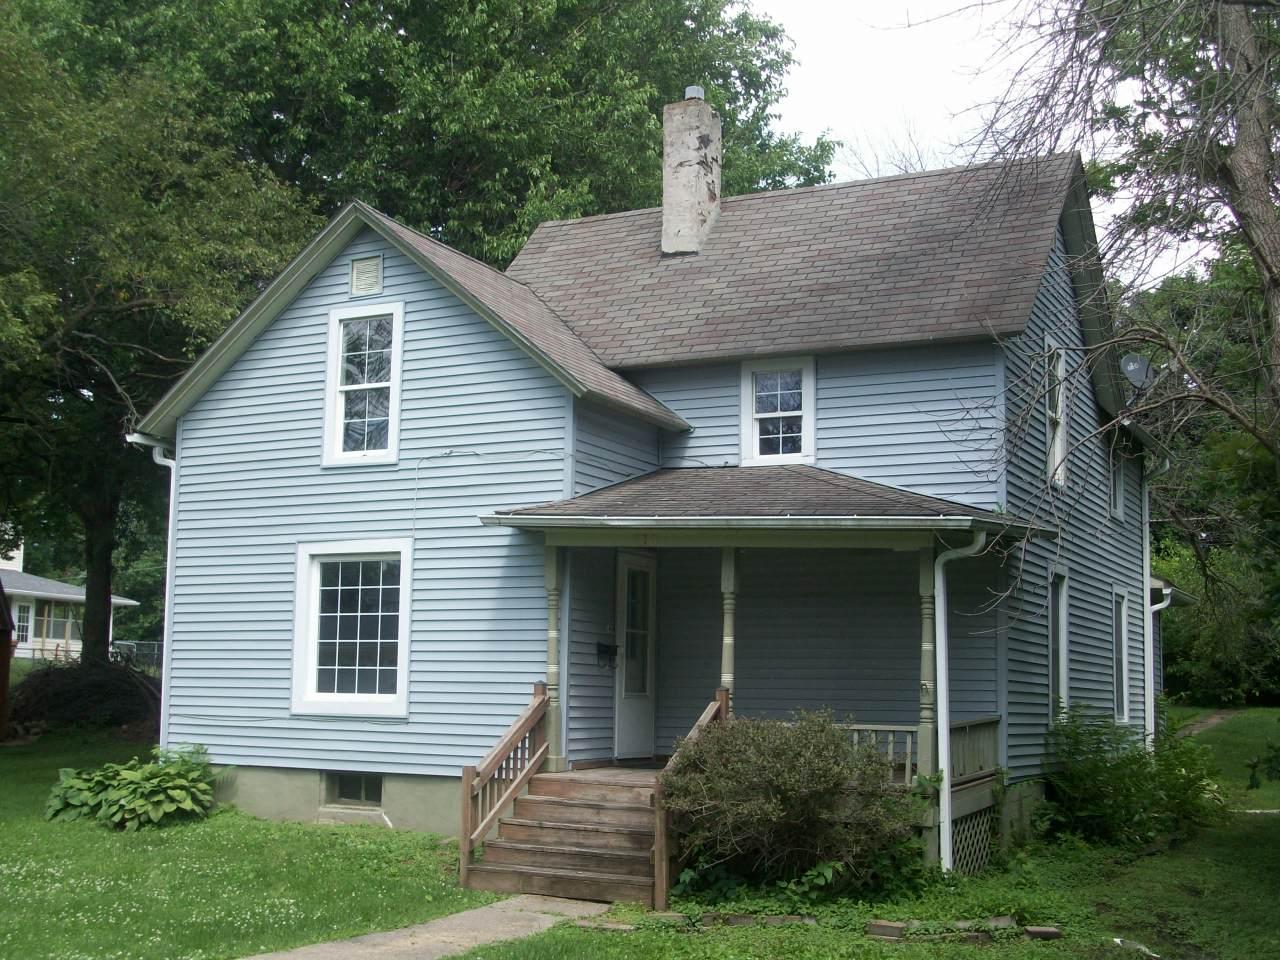 820 Elm, Grinnell, Iowa 50112-1032, 3 Bedrooms Bedrooms, ,1 BathroomBathrooms,Single Family,For Sale,Elm,5613725